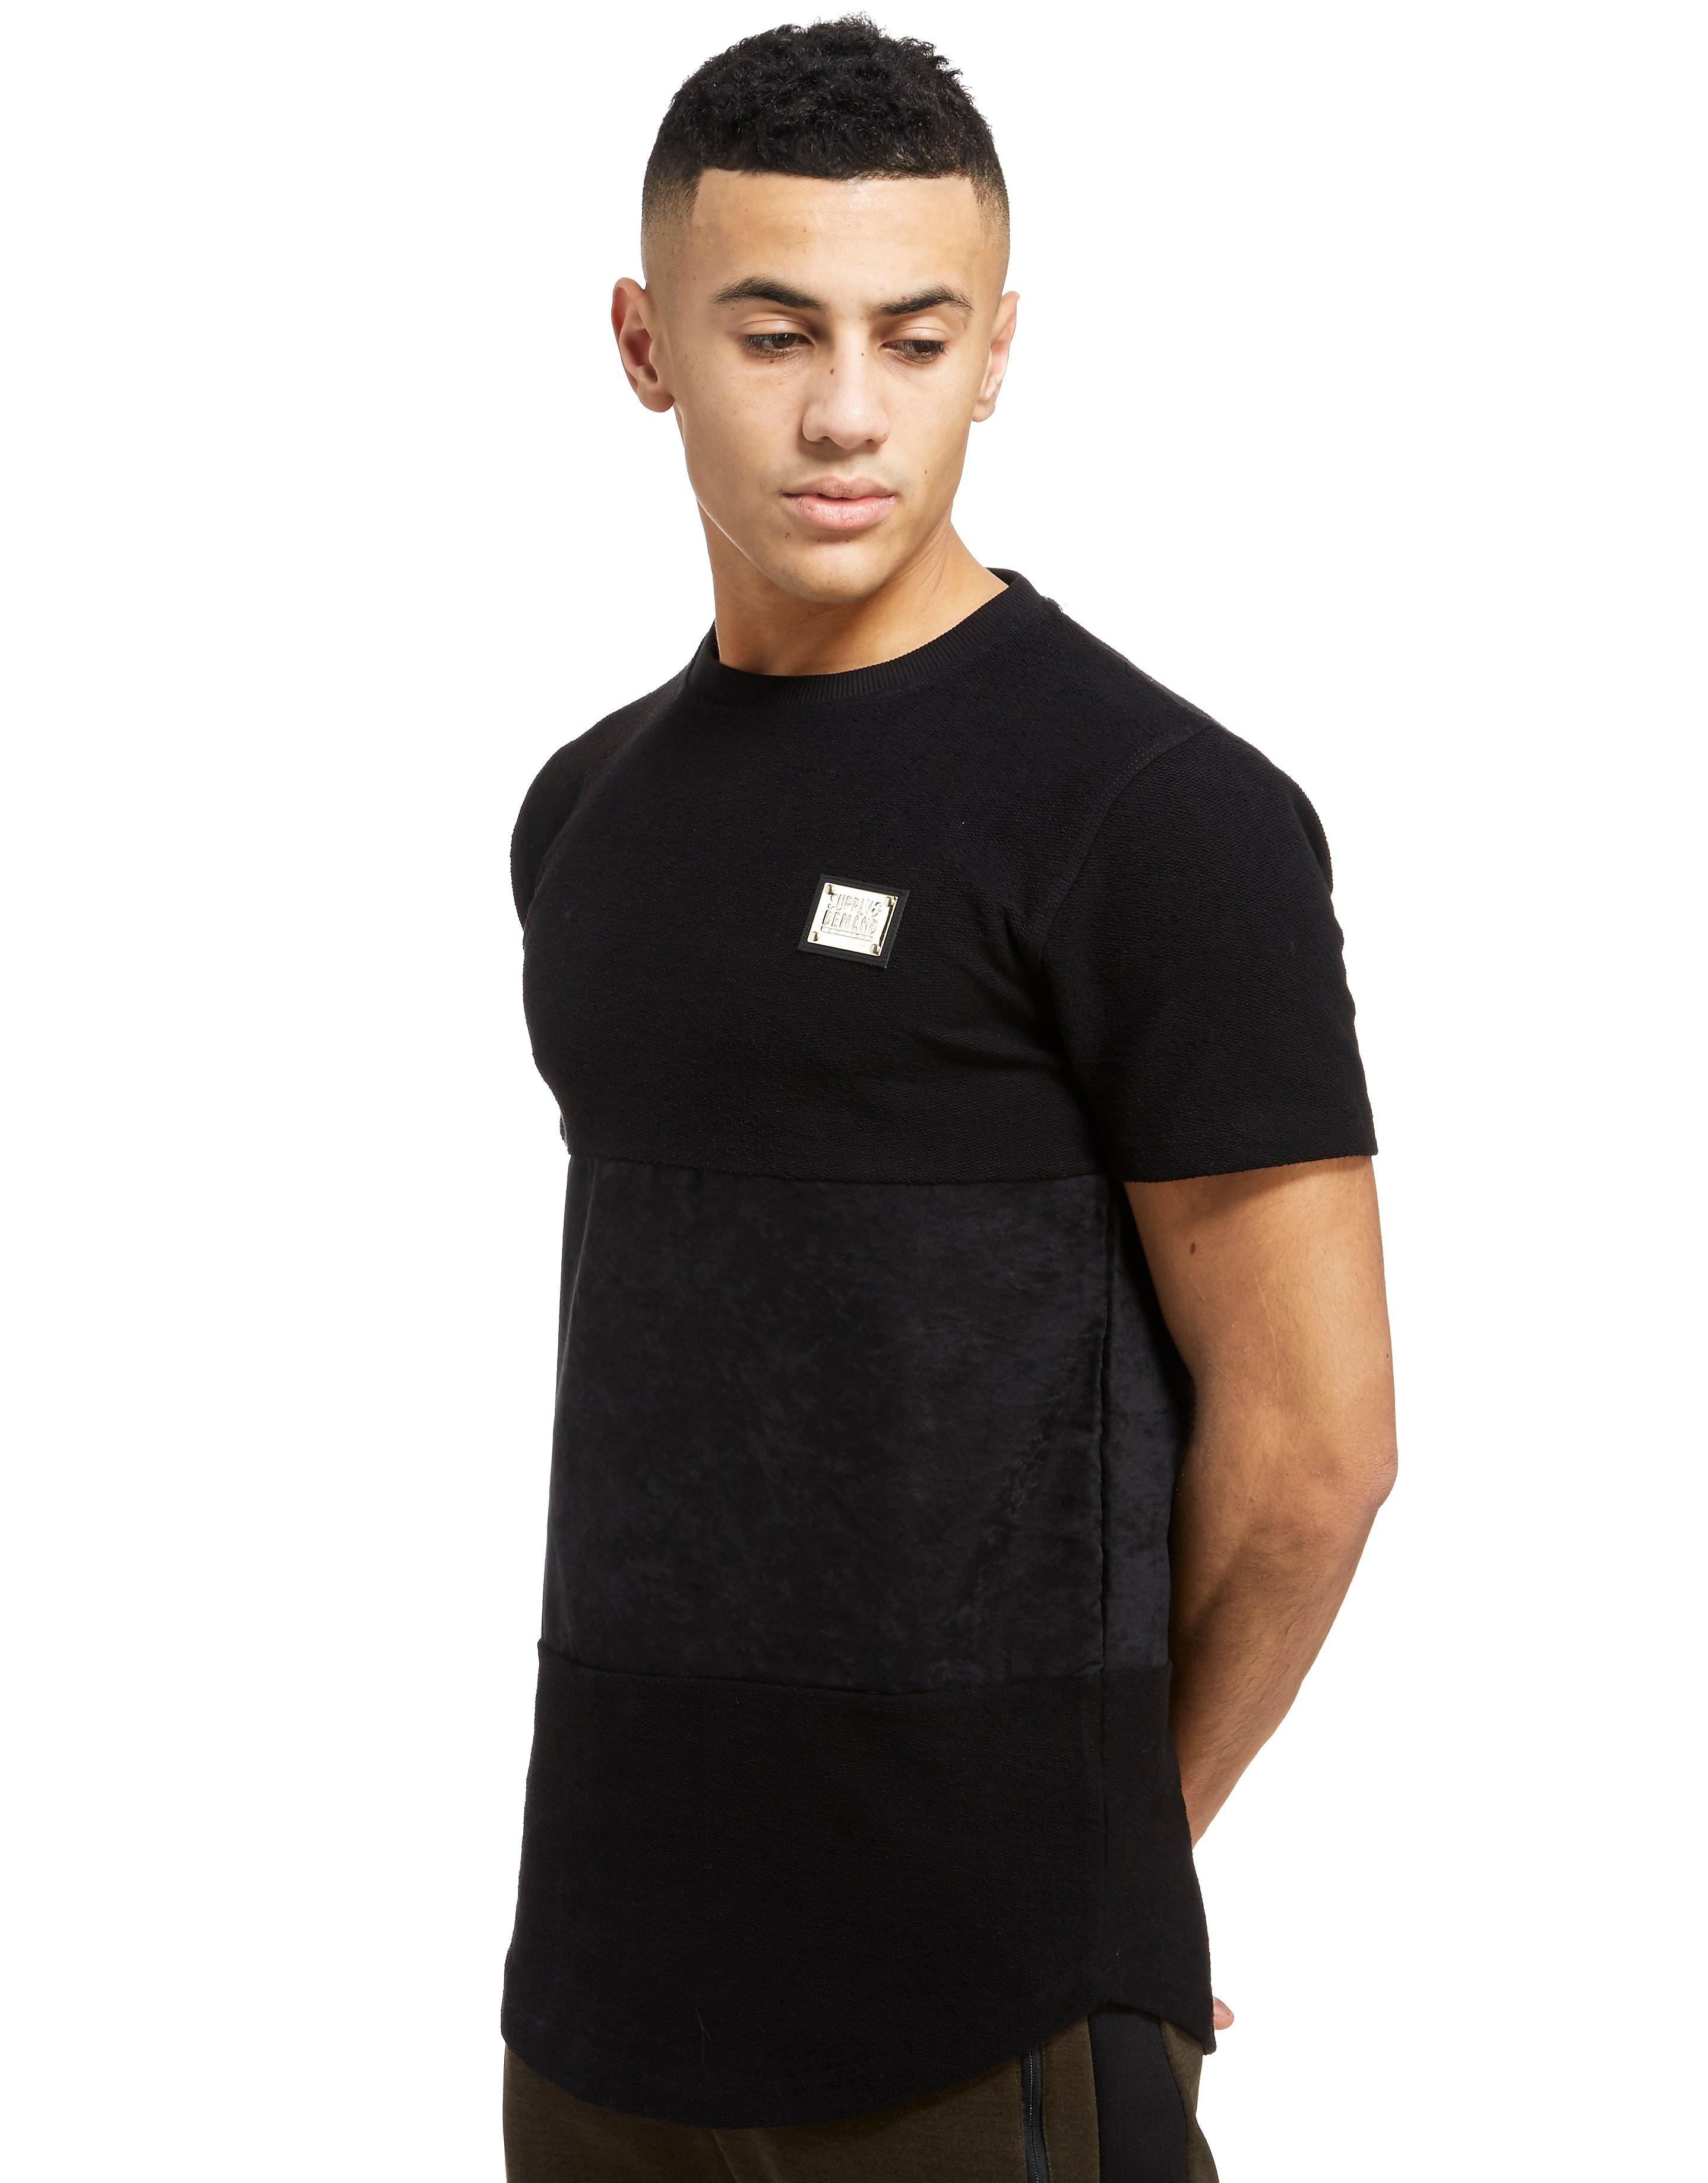 Supply & Demand Slumber T-Shirt